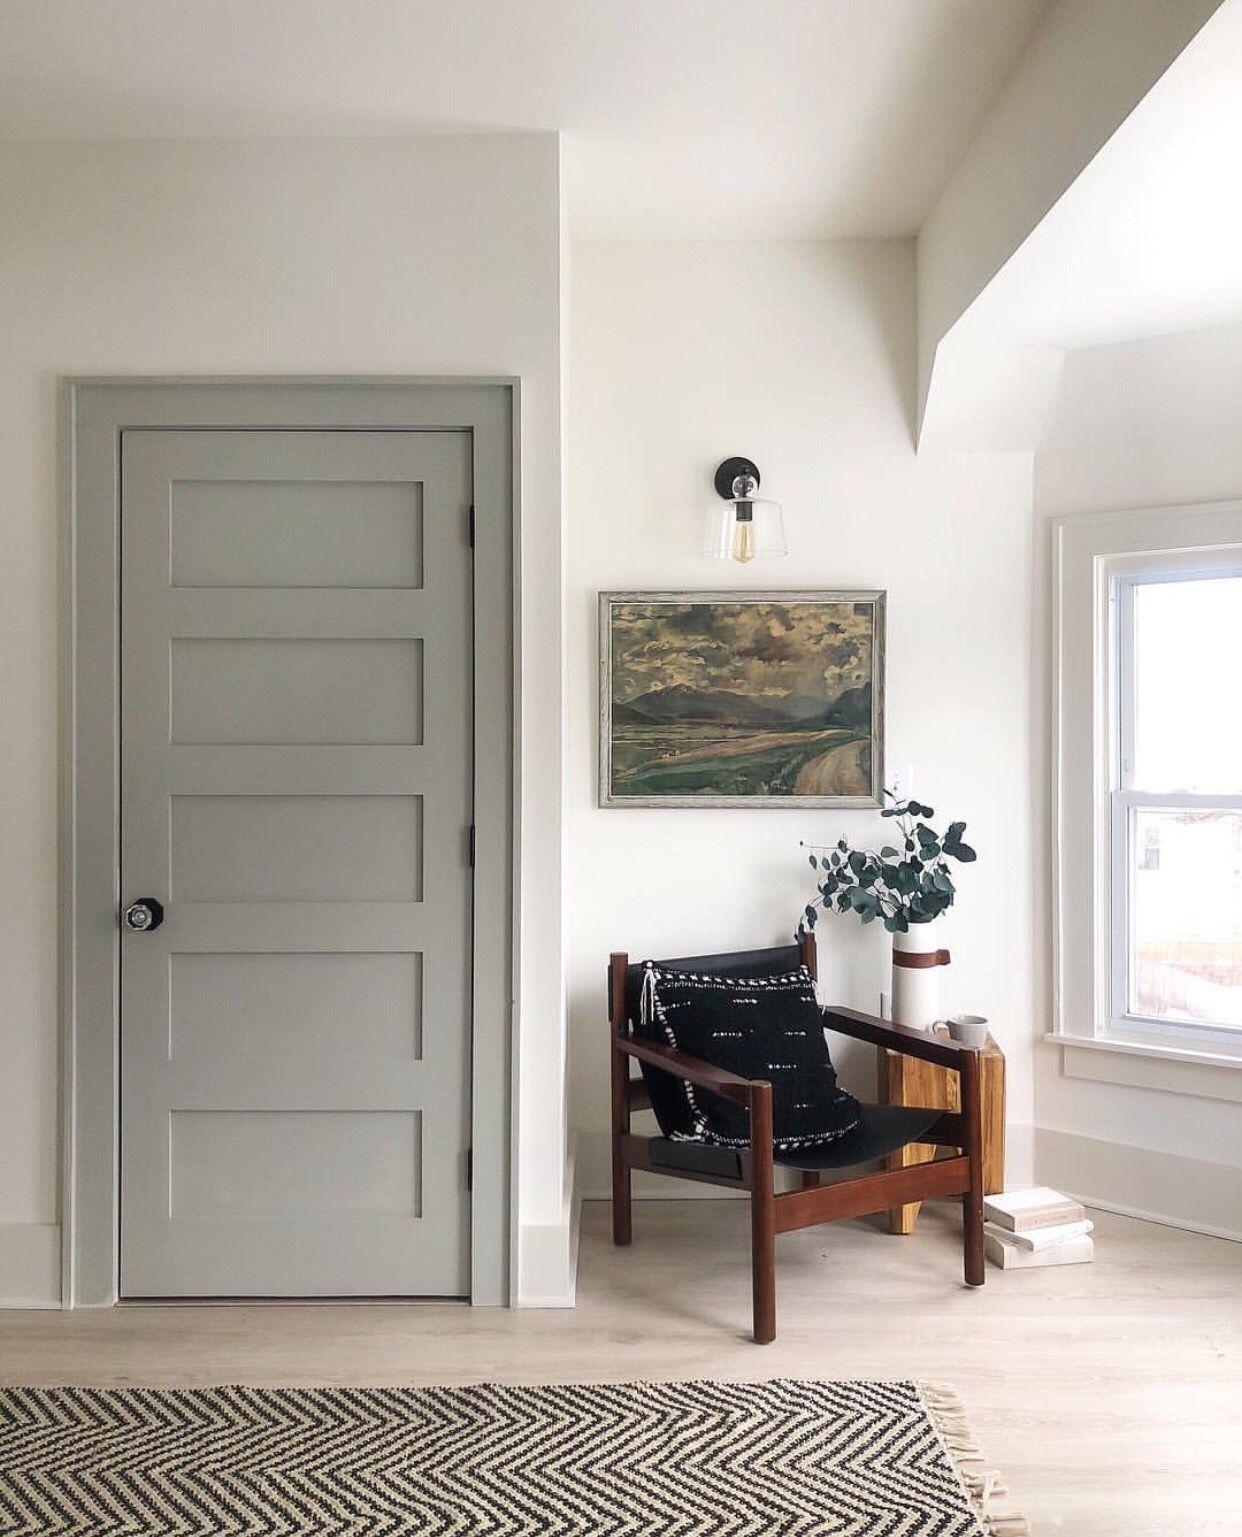 Pin Insta F O R T A N D F I E L D Cozy Reading Corner Chair Vintage Oil Painting Interior Paint Combinations Doors Interior Grey Interior Doors